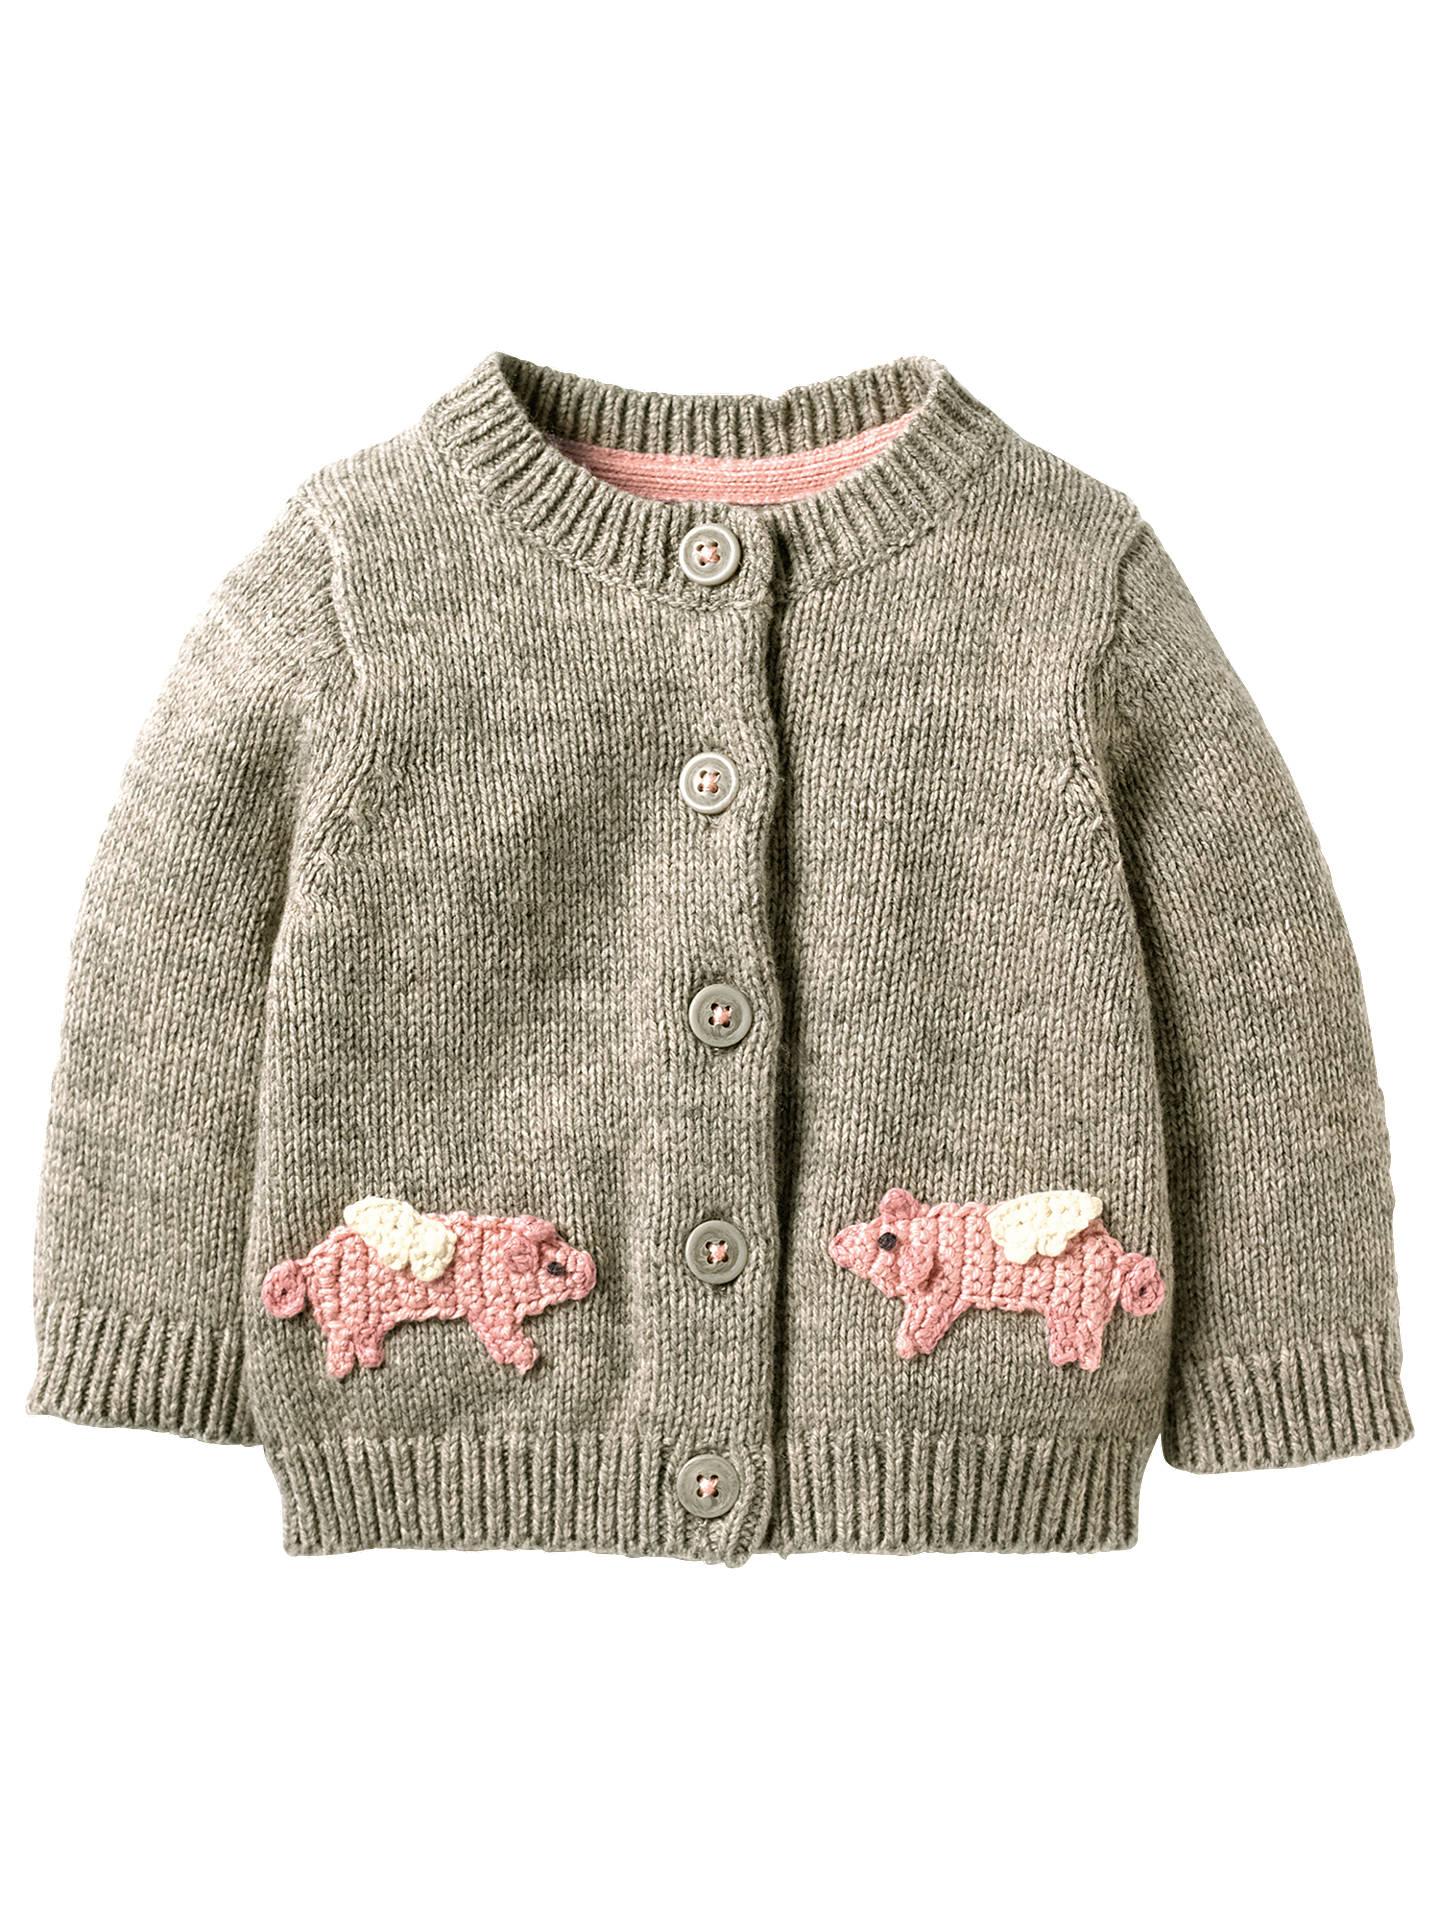 9bffa0762732 Mini Boden Baby Character Crochet Cardigan